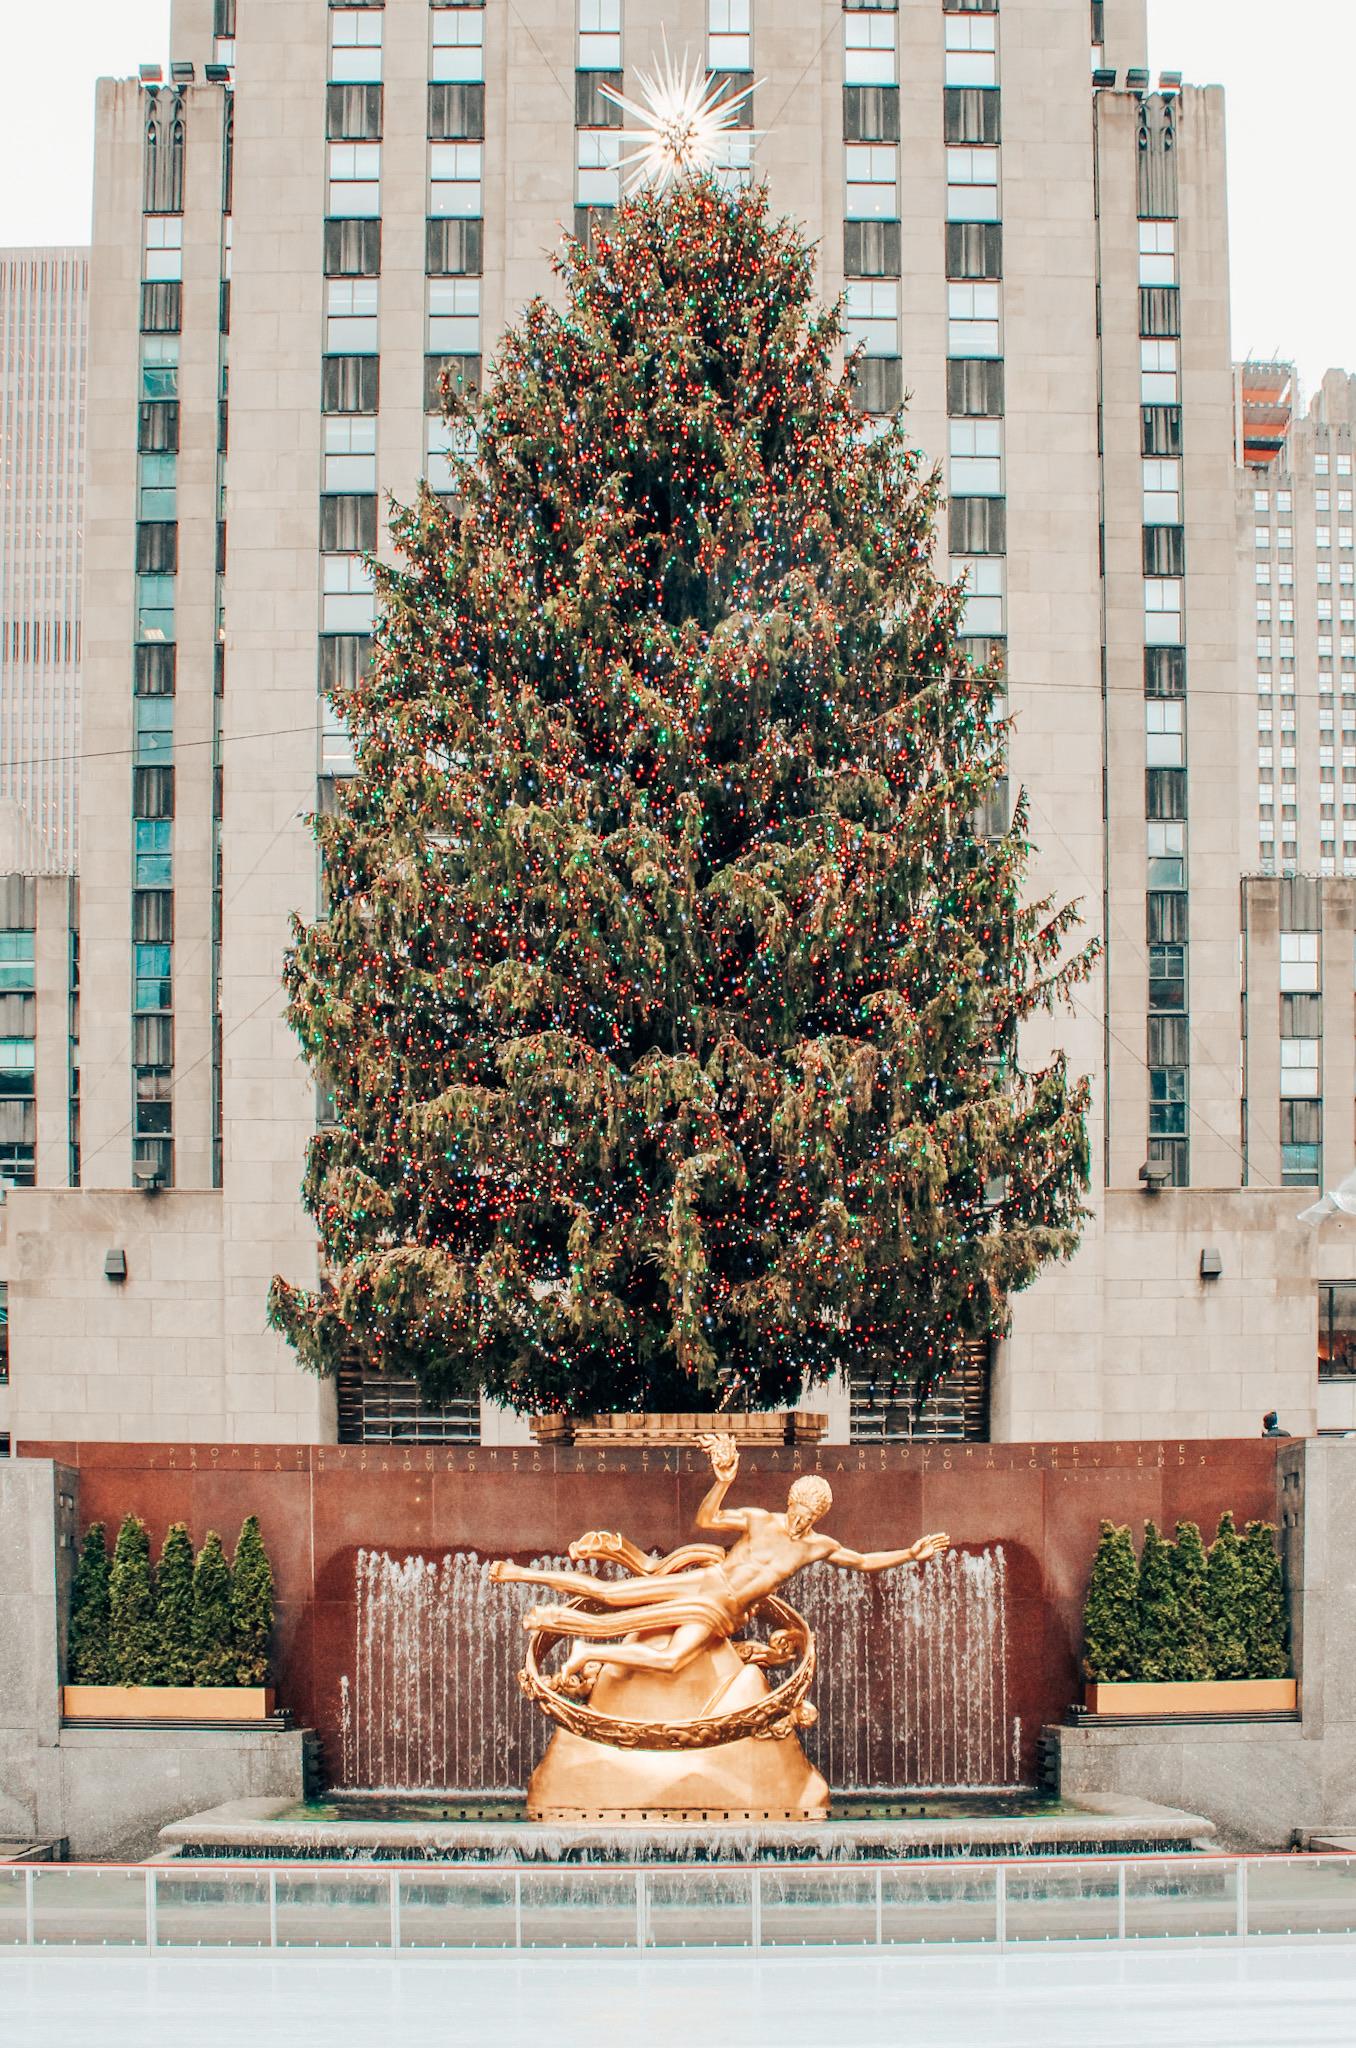 The tree at Rockefeller Center in December!